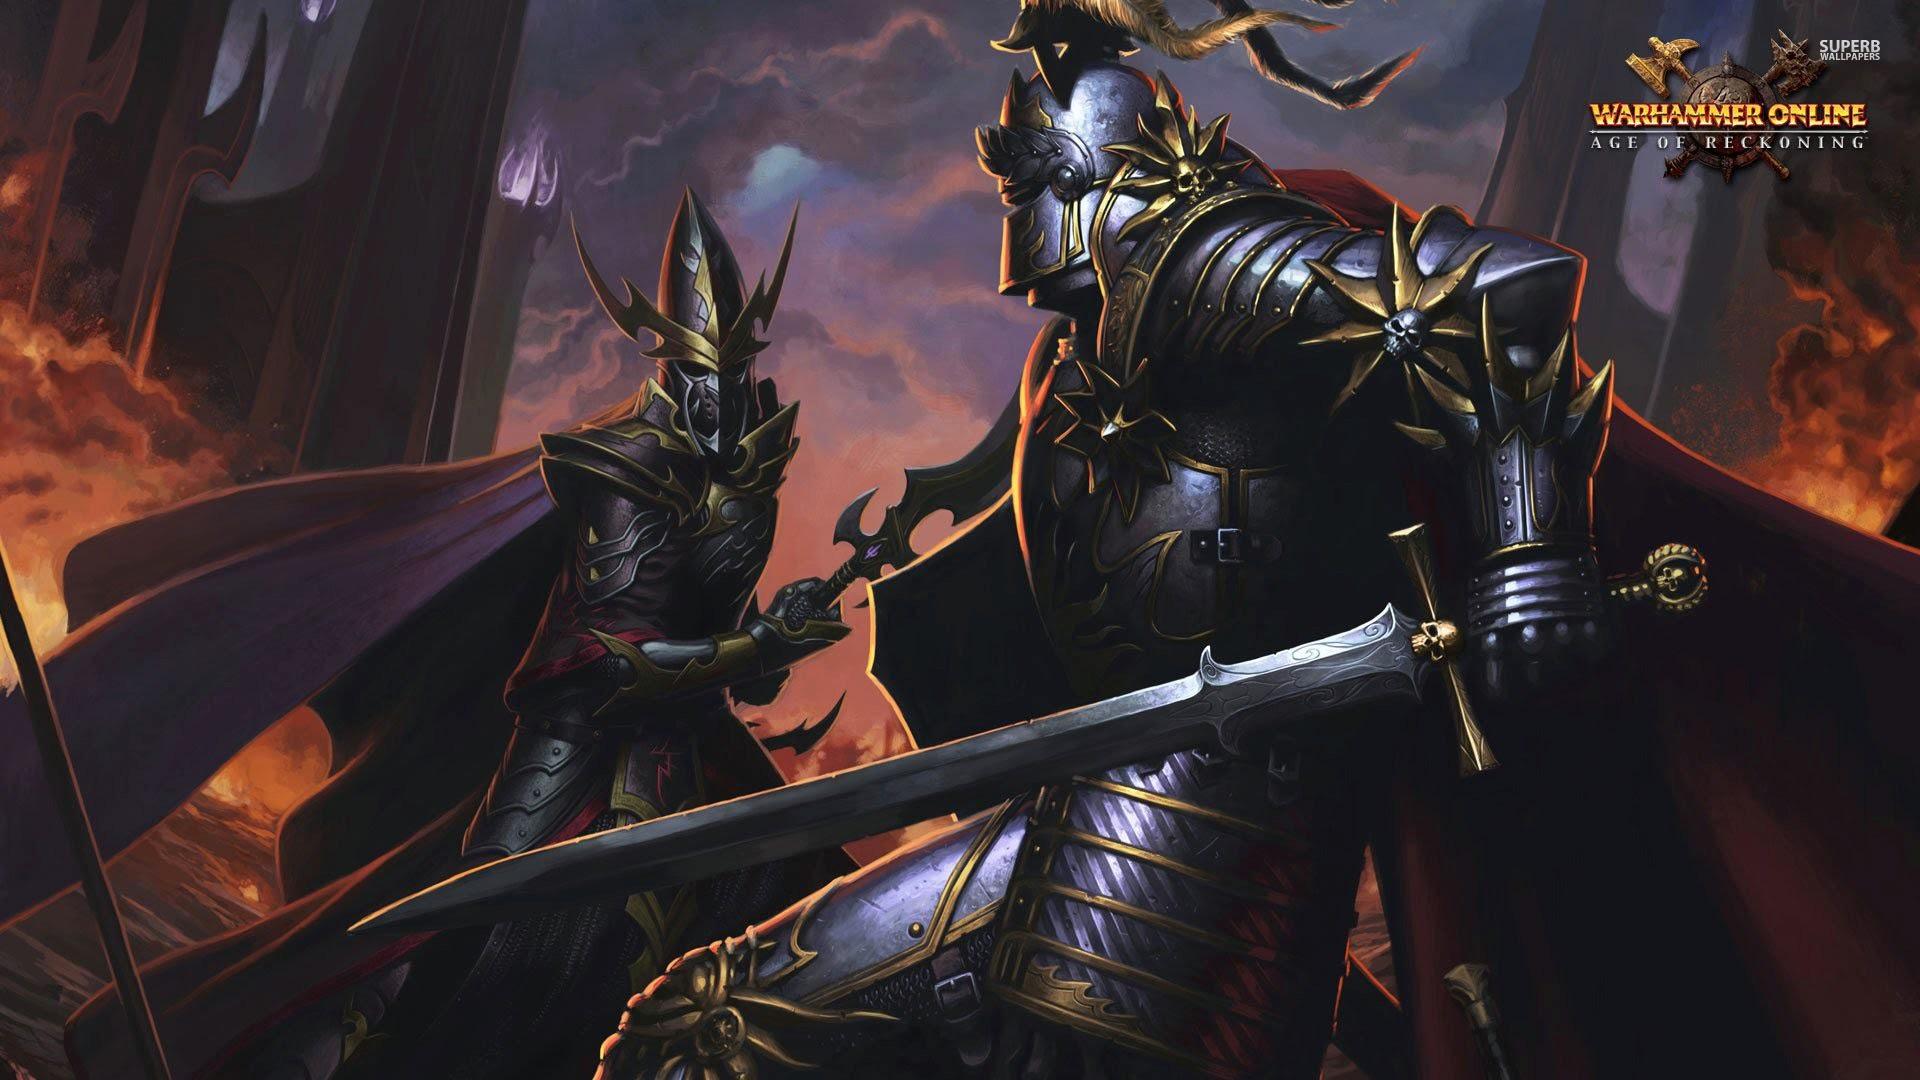 Total War Warhammer Wallpaper: Total War Warhammer Wallpapers 1920x1080 (89+ Images